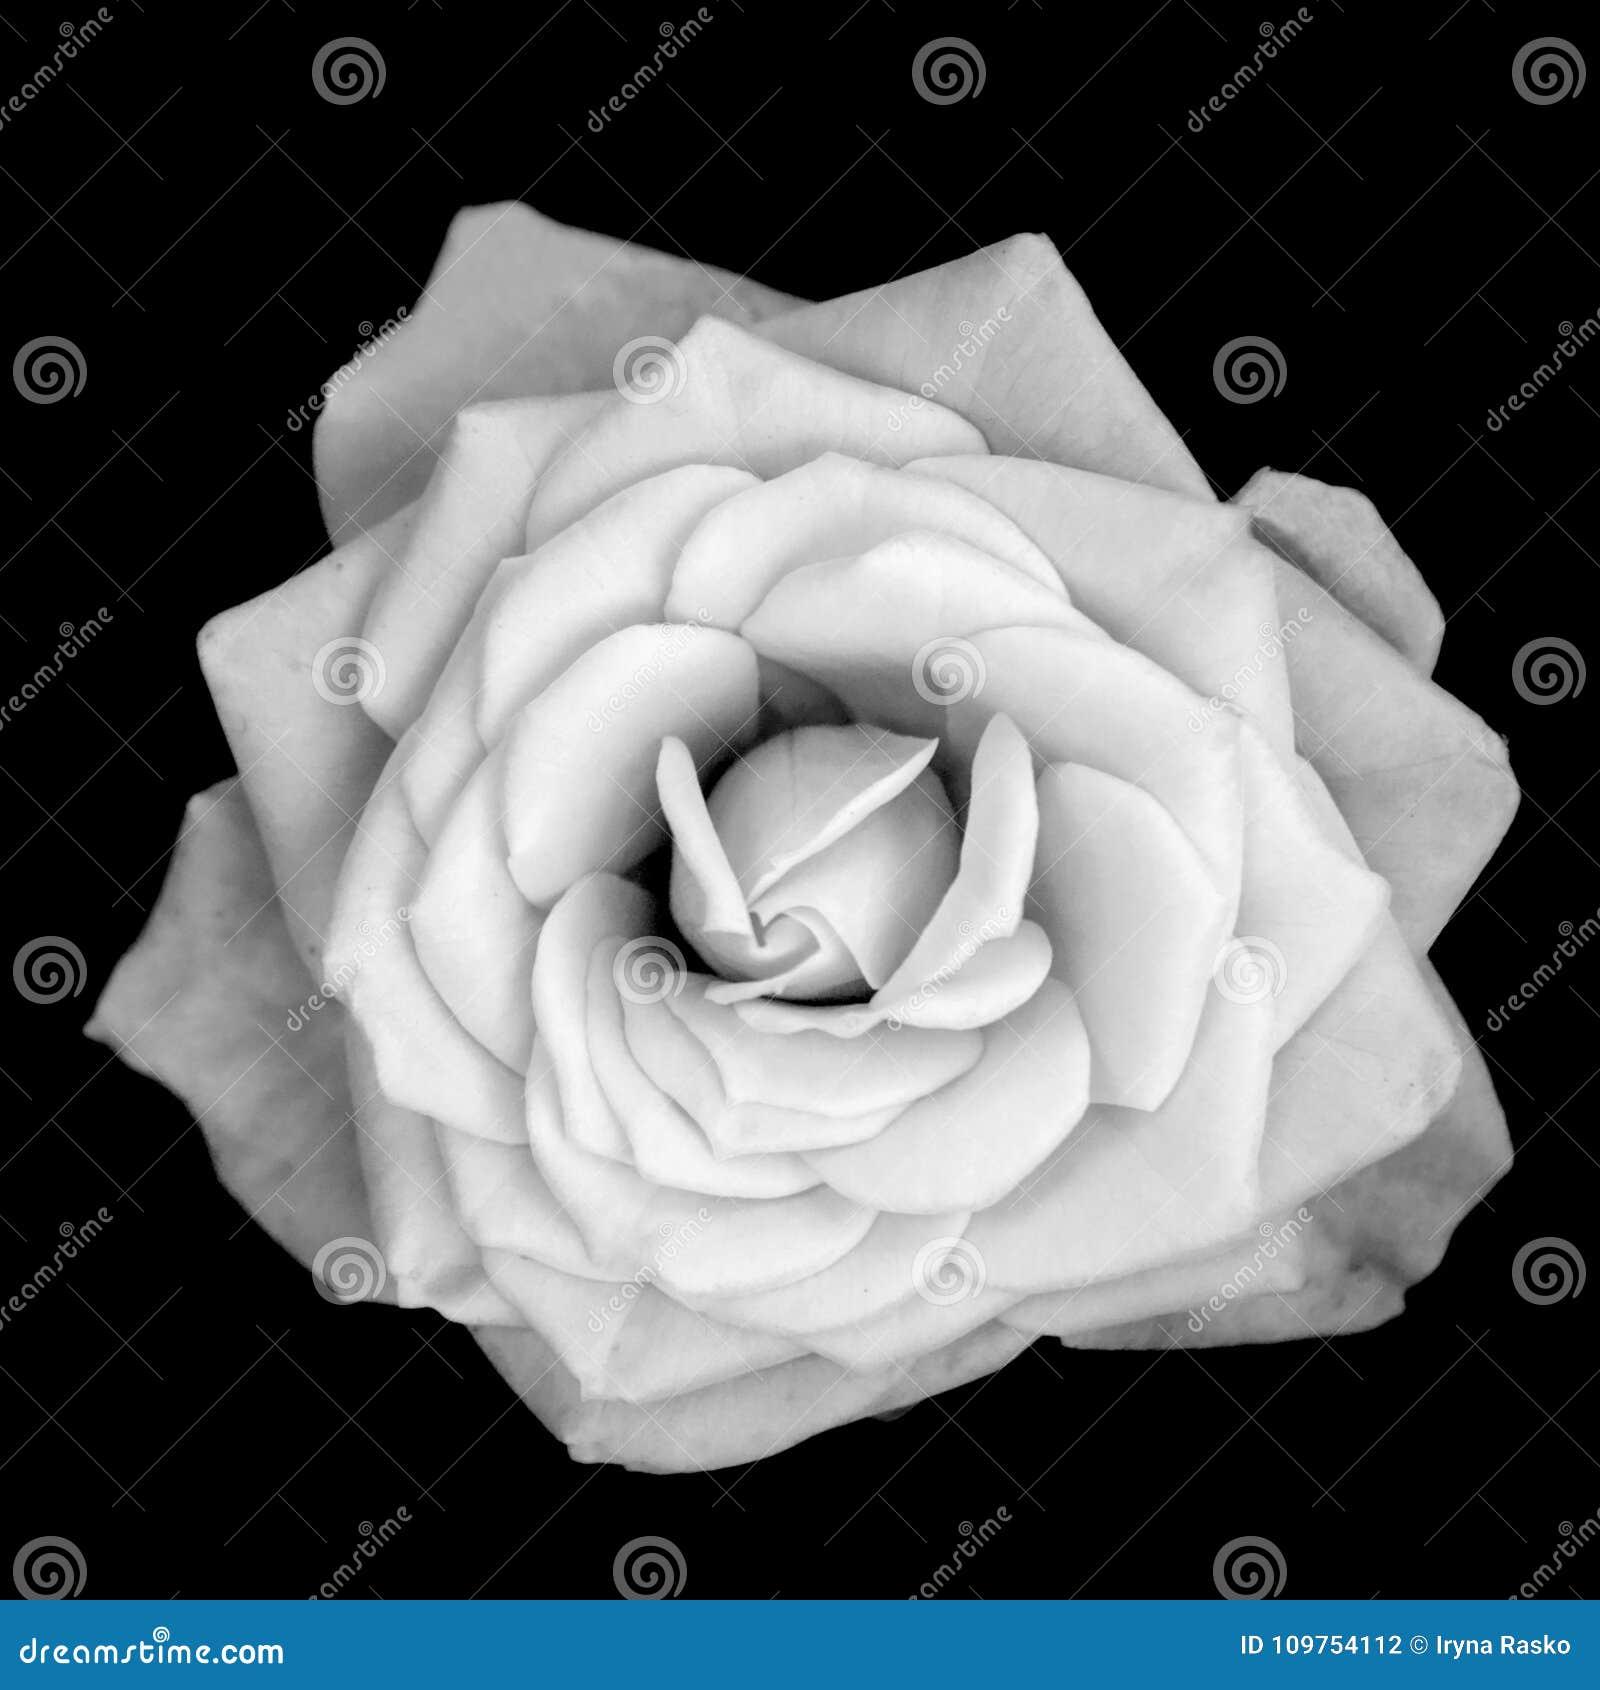 One rose flower isolated on black background